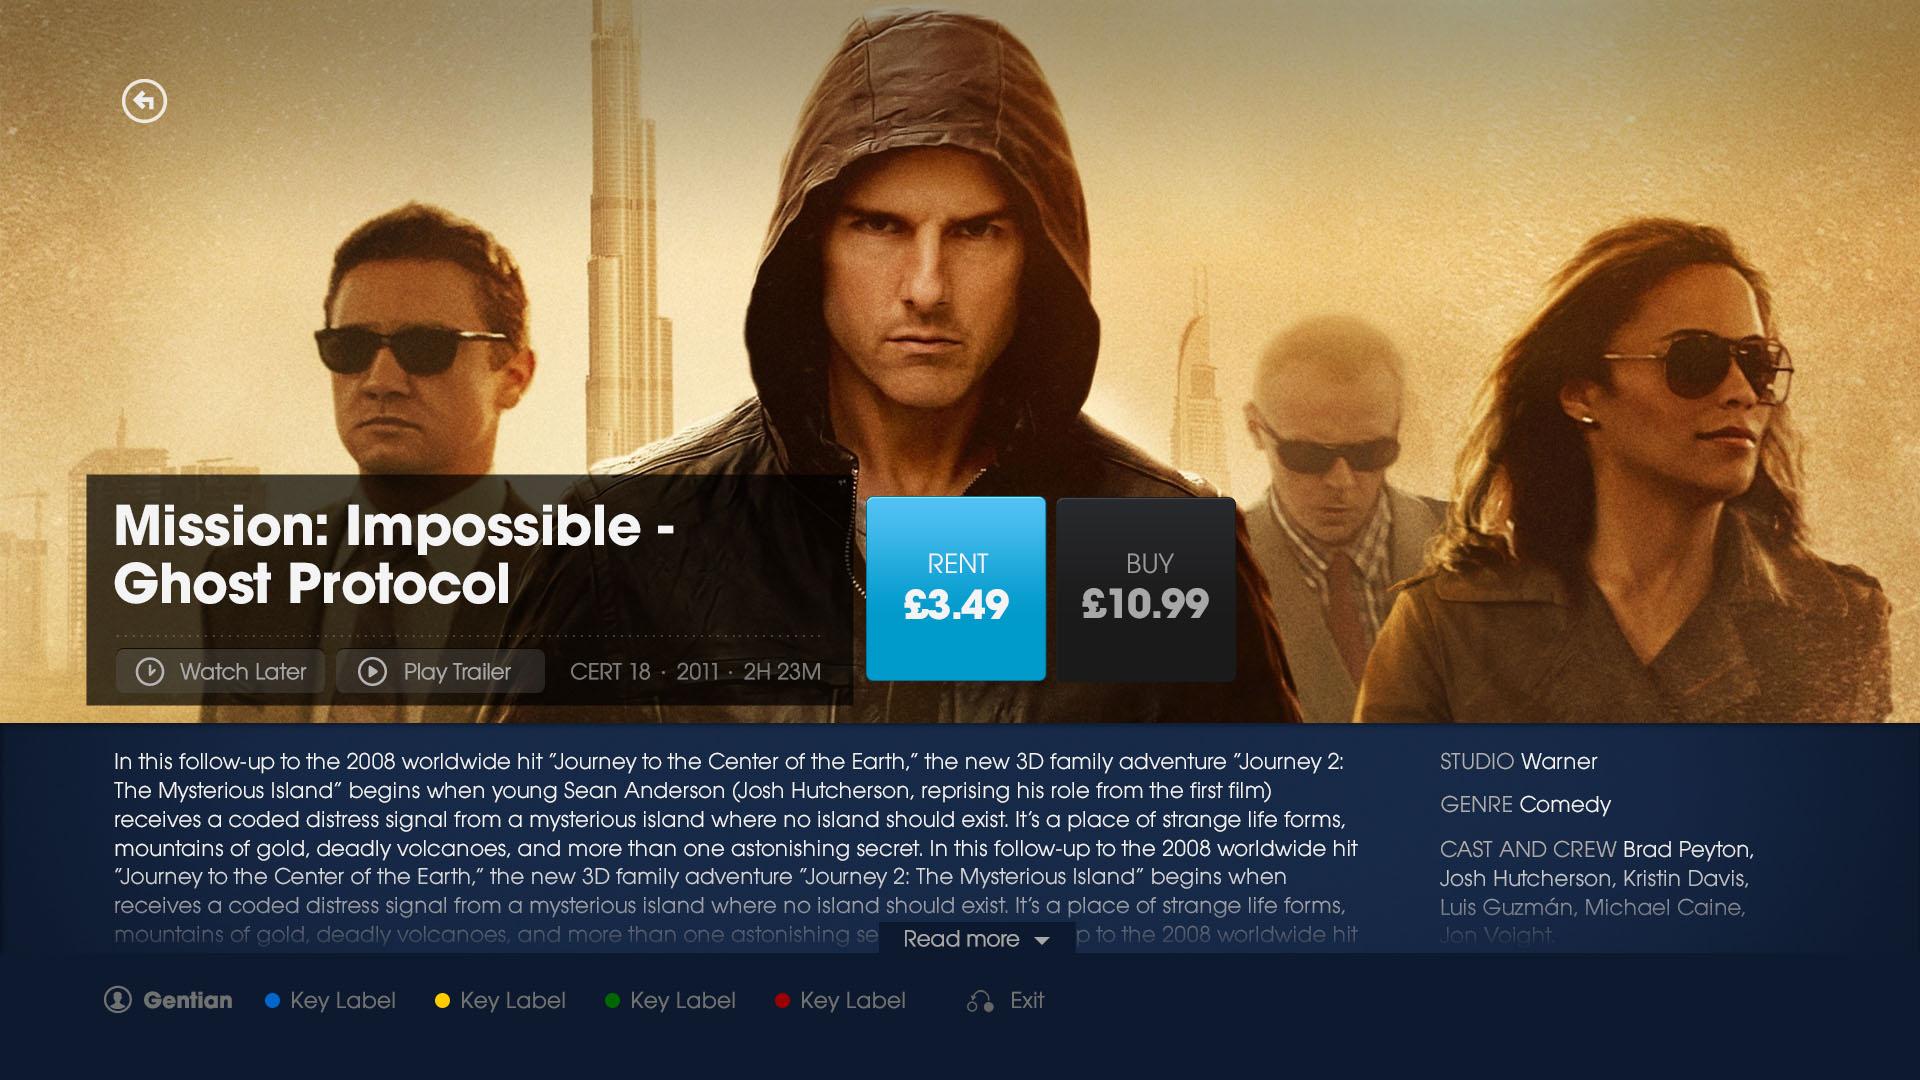 Movie_lockup_synopsis_pre-purchase.jpg